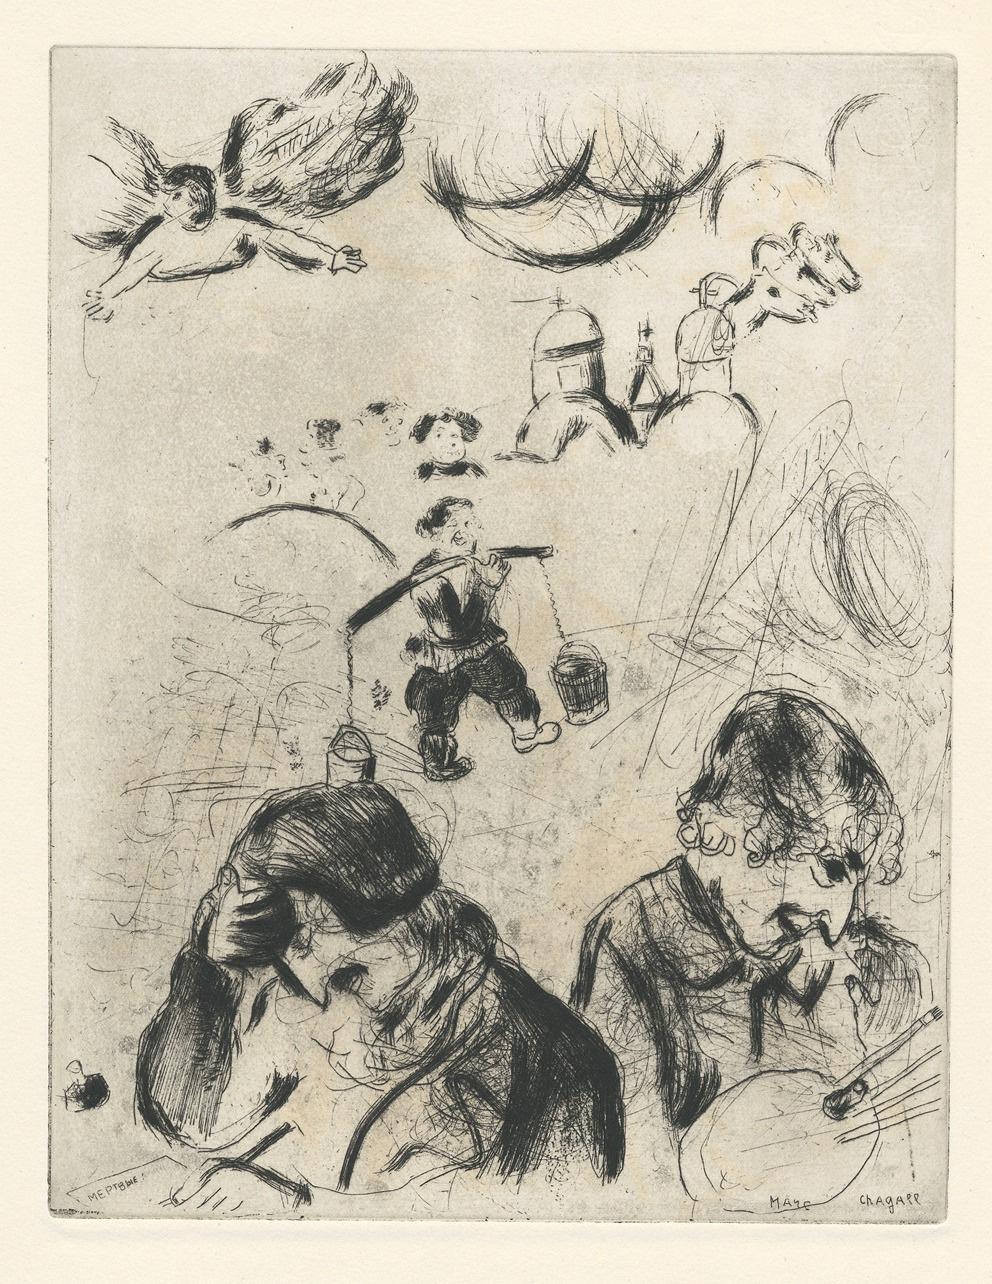 Marc Chagall. Gogol and Chagall